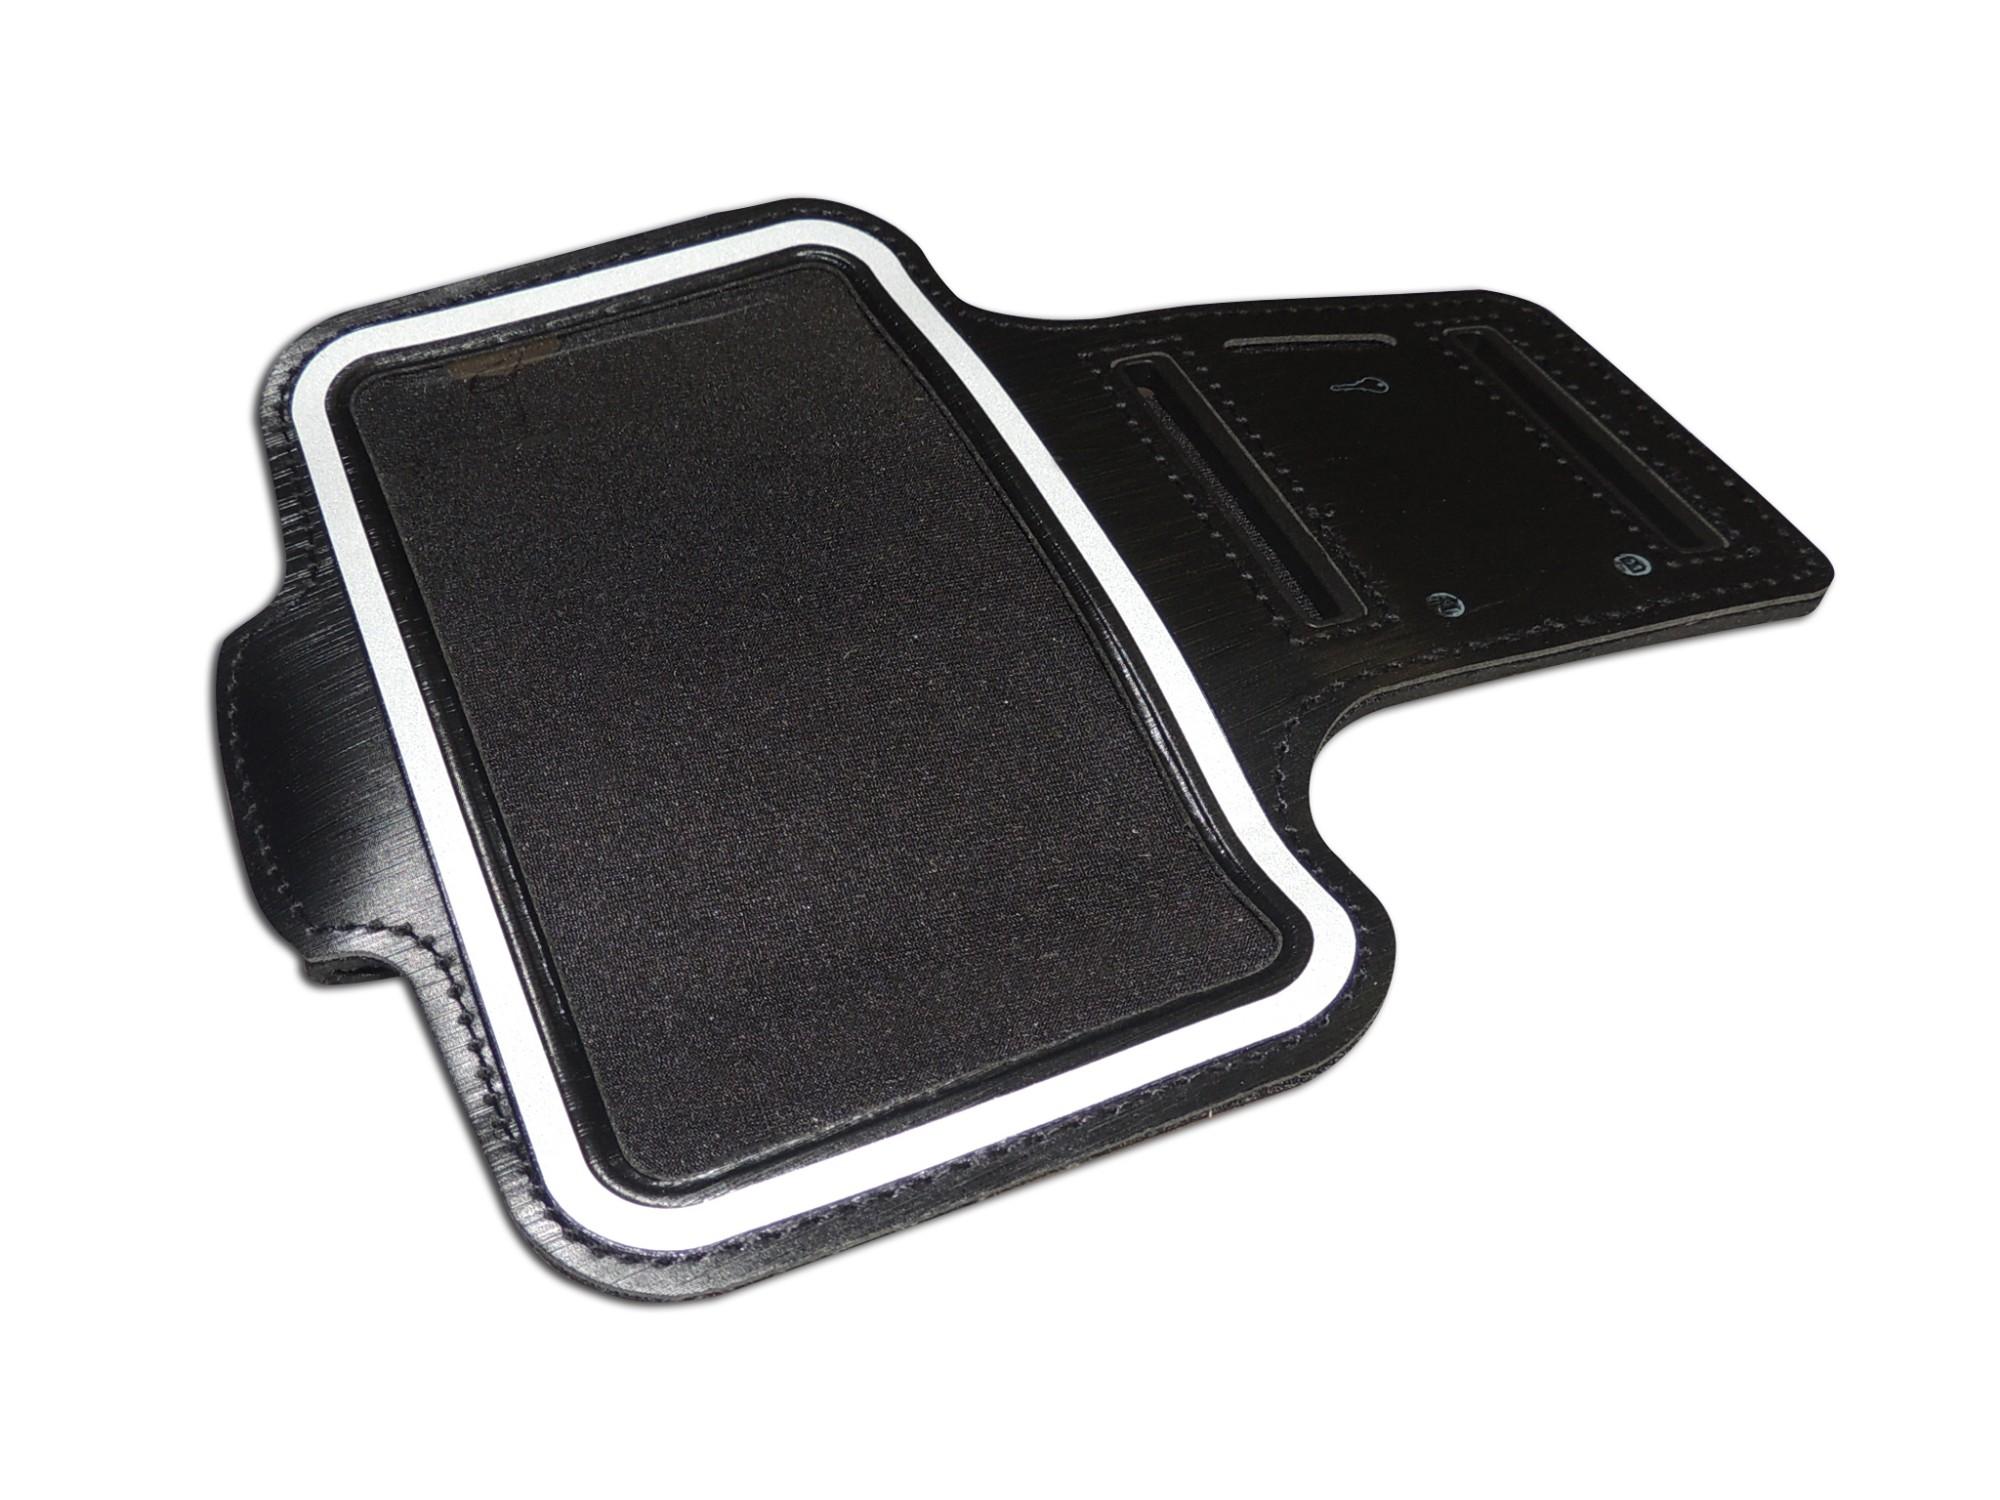 Sandberg Sport armband iPhone 6ZZZZZ], 405-37